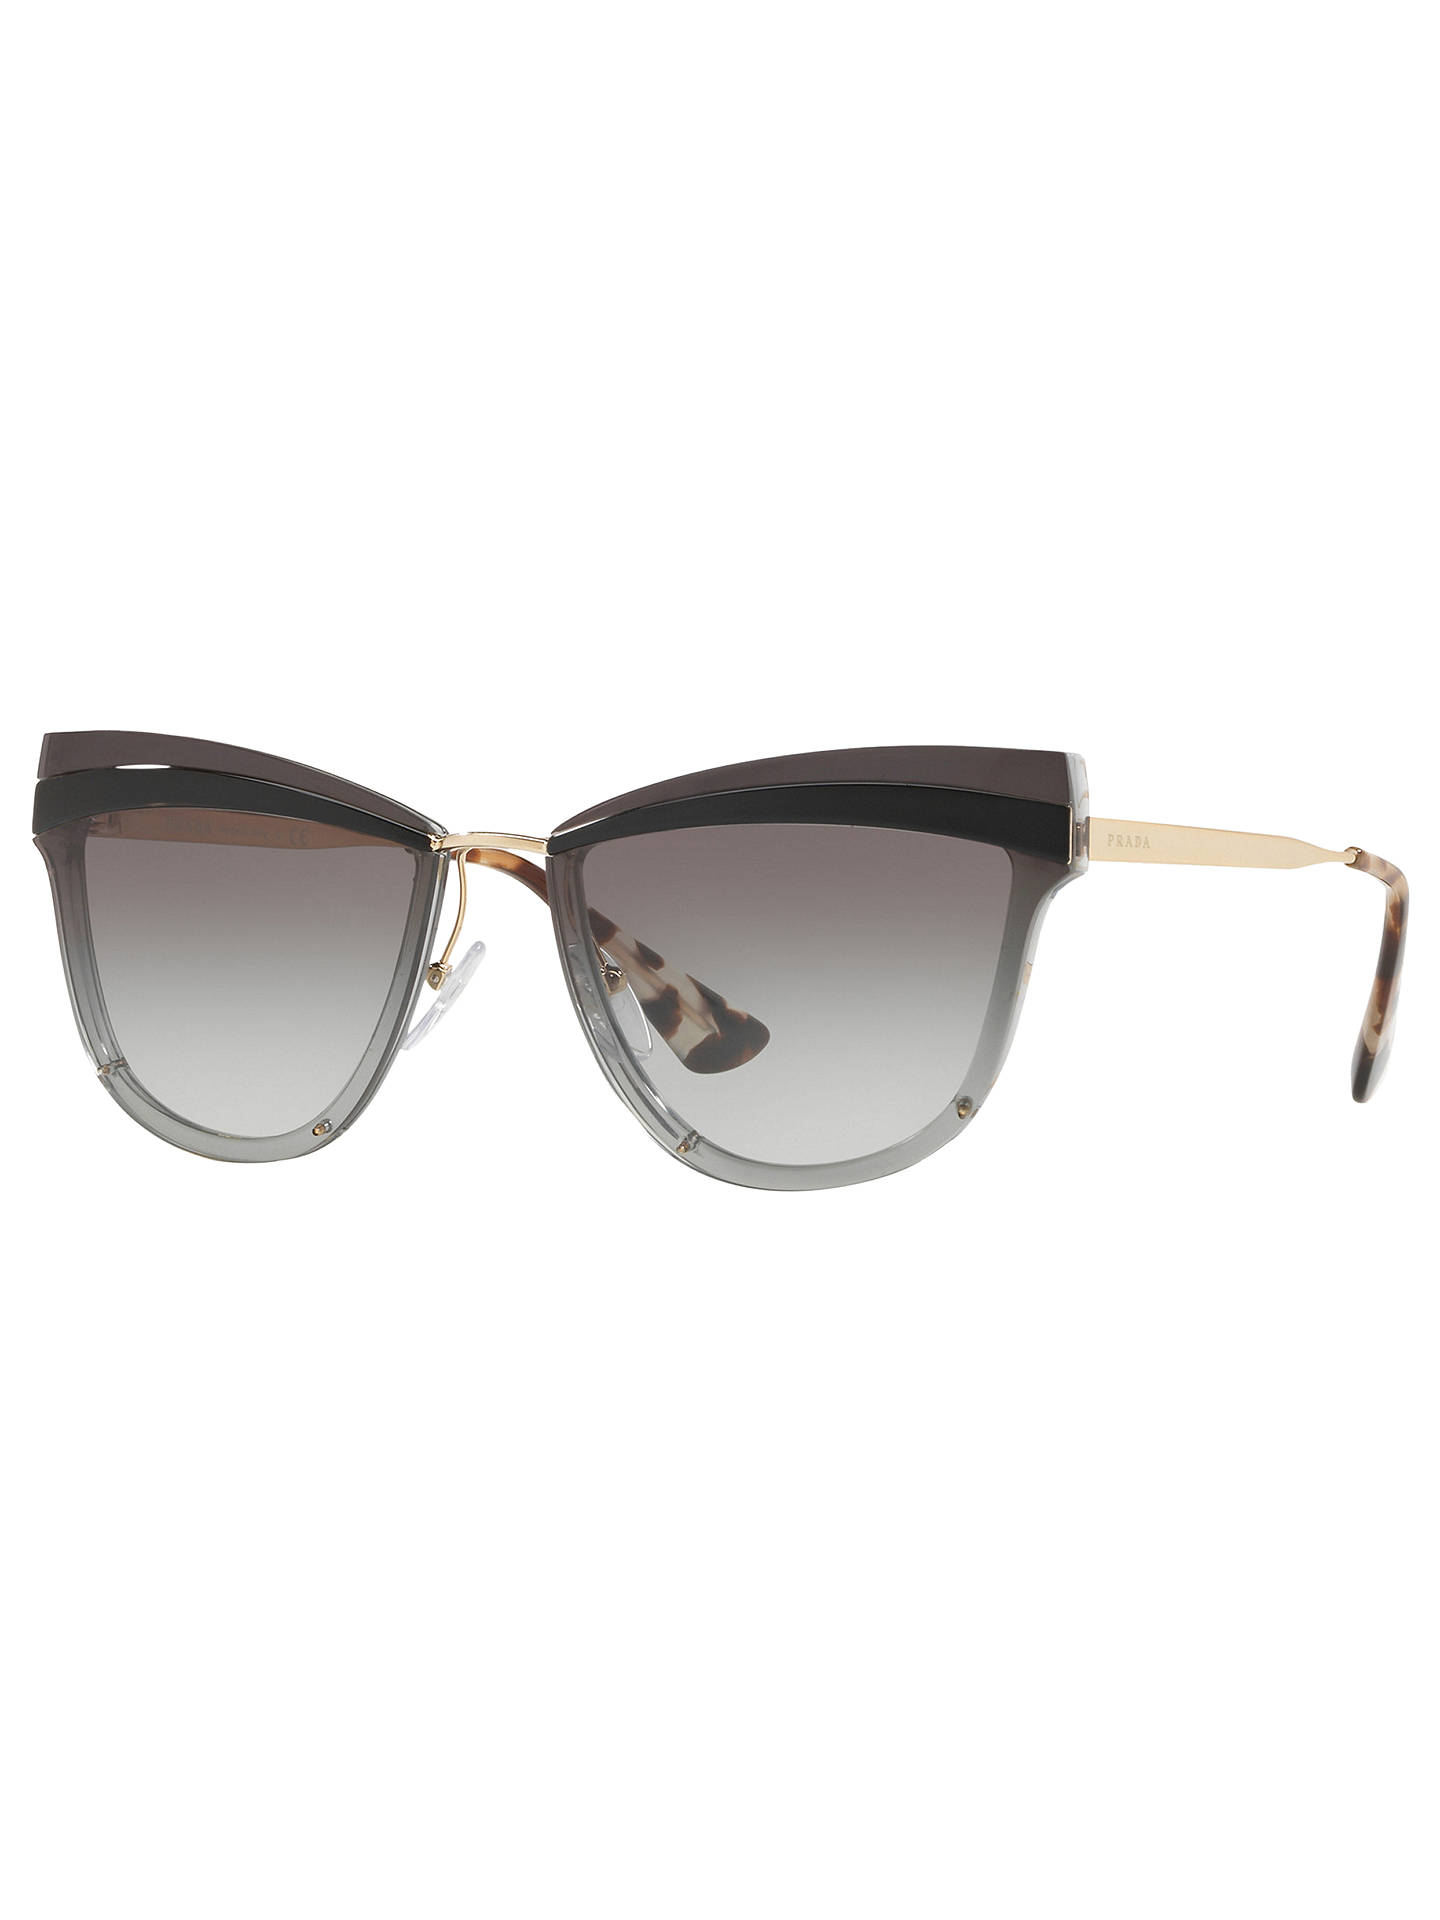 72734a82d8 Buy Prada PR 12US Cat's Eye Sunglasses, Gold/Grey Gradient Online at  johnlewis.